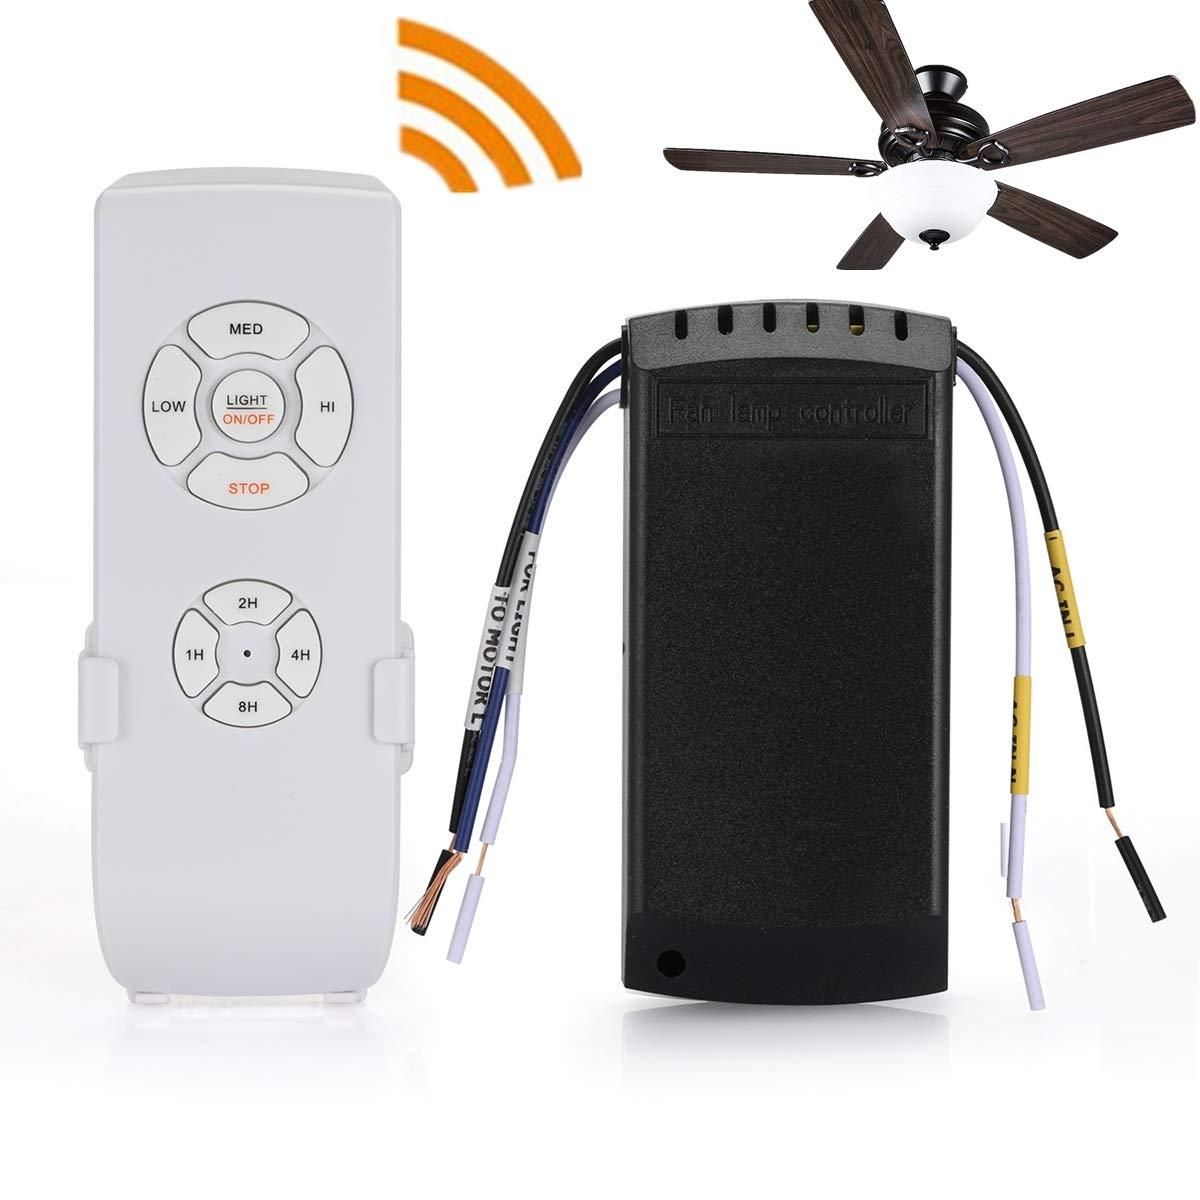 QIACHIP Ceiling Fan Remote Control Kit,WI-FI Smart Universal Ceiling Fan with Amazon Alexa by QIACHIP